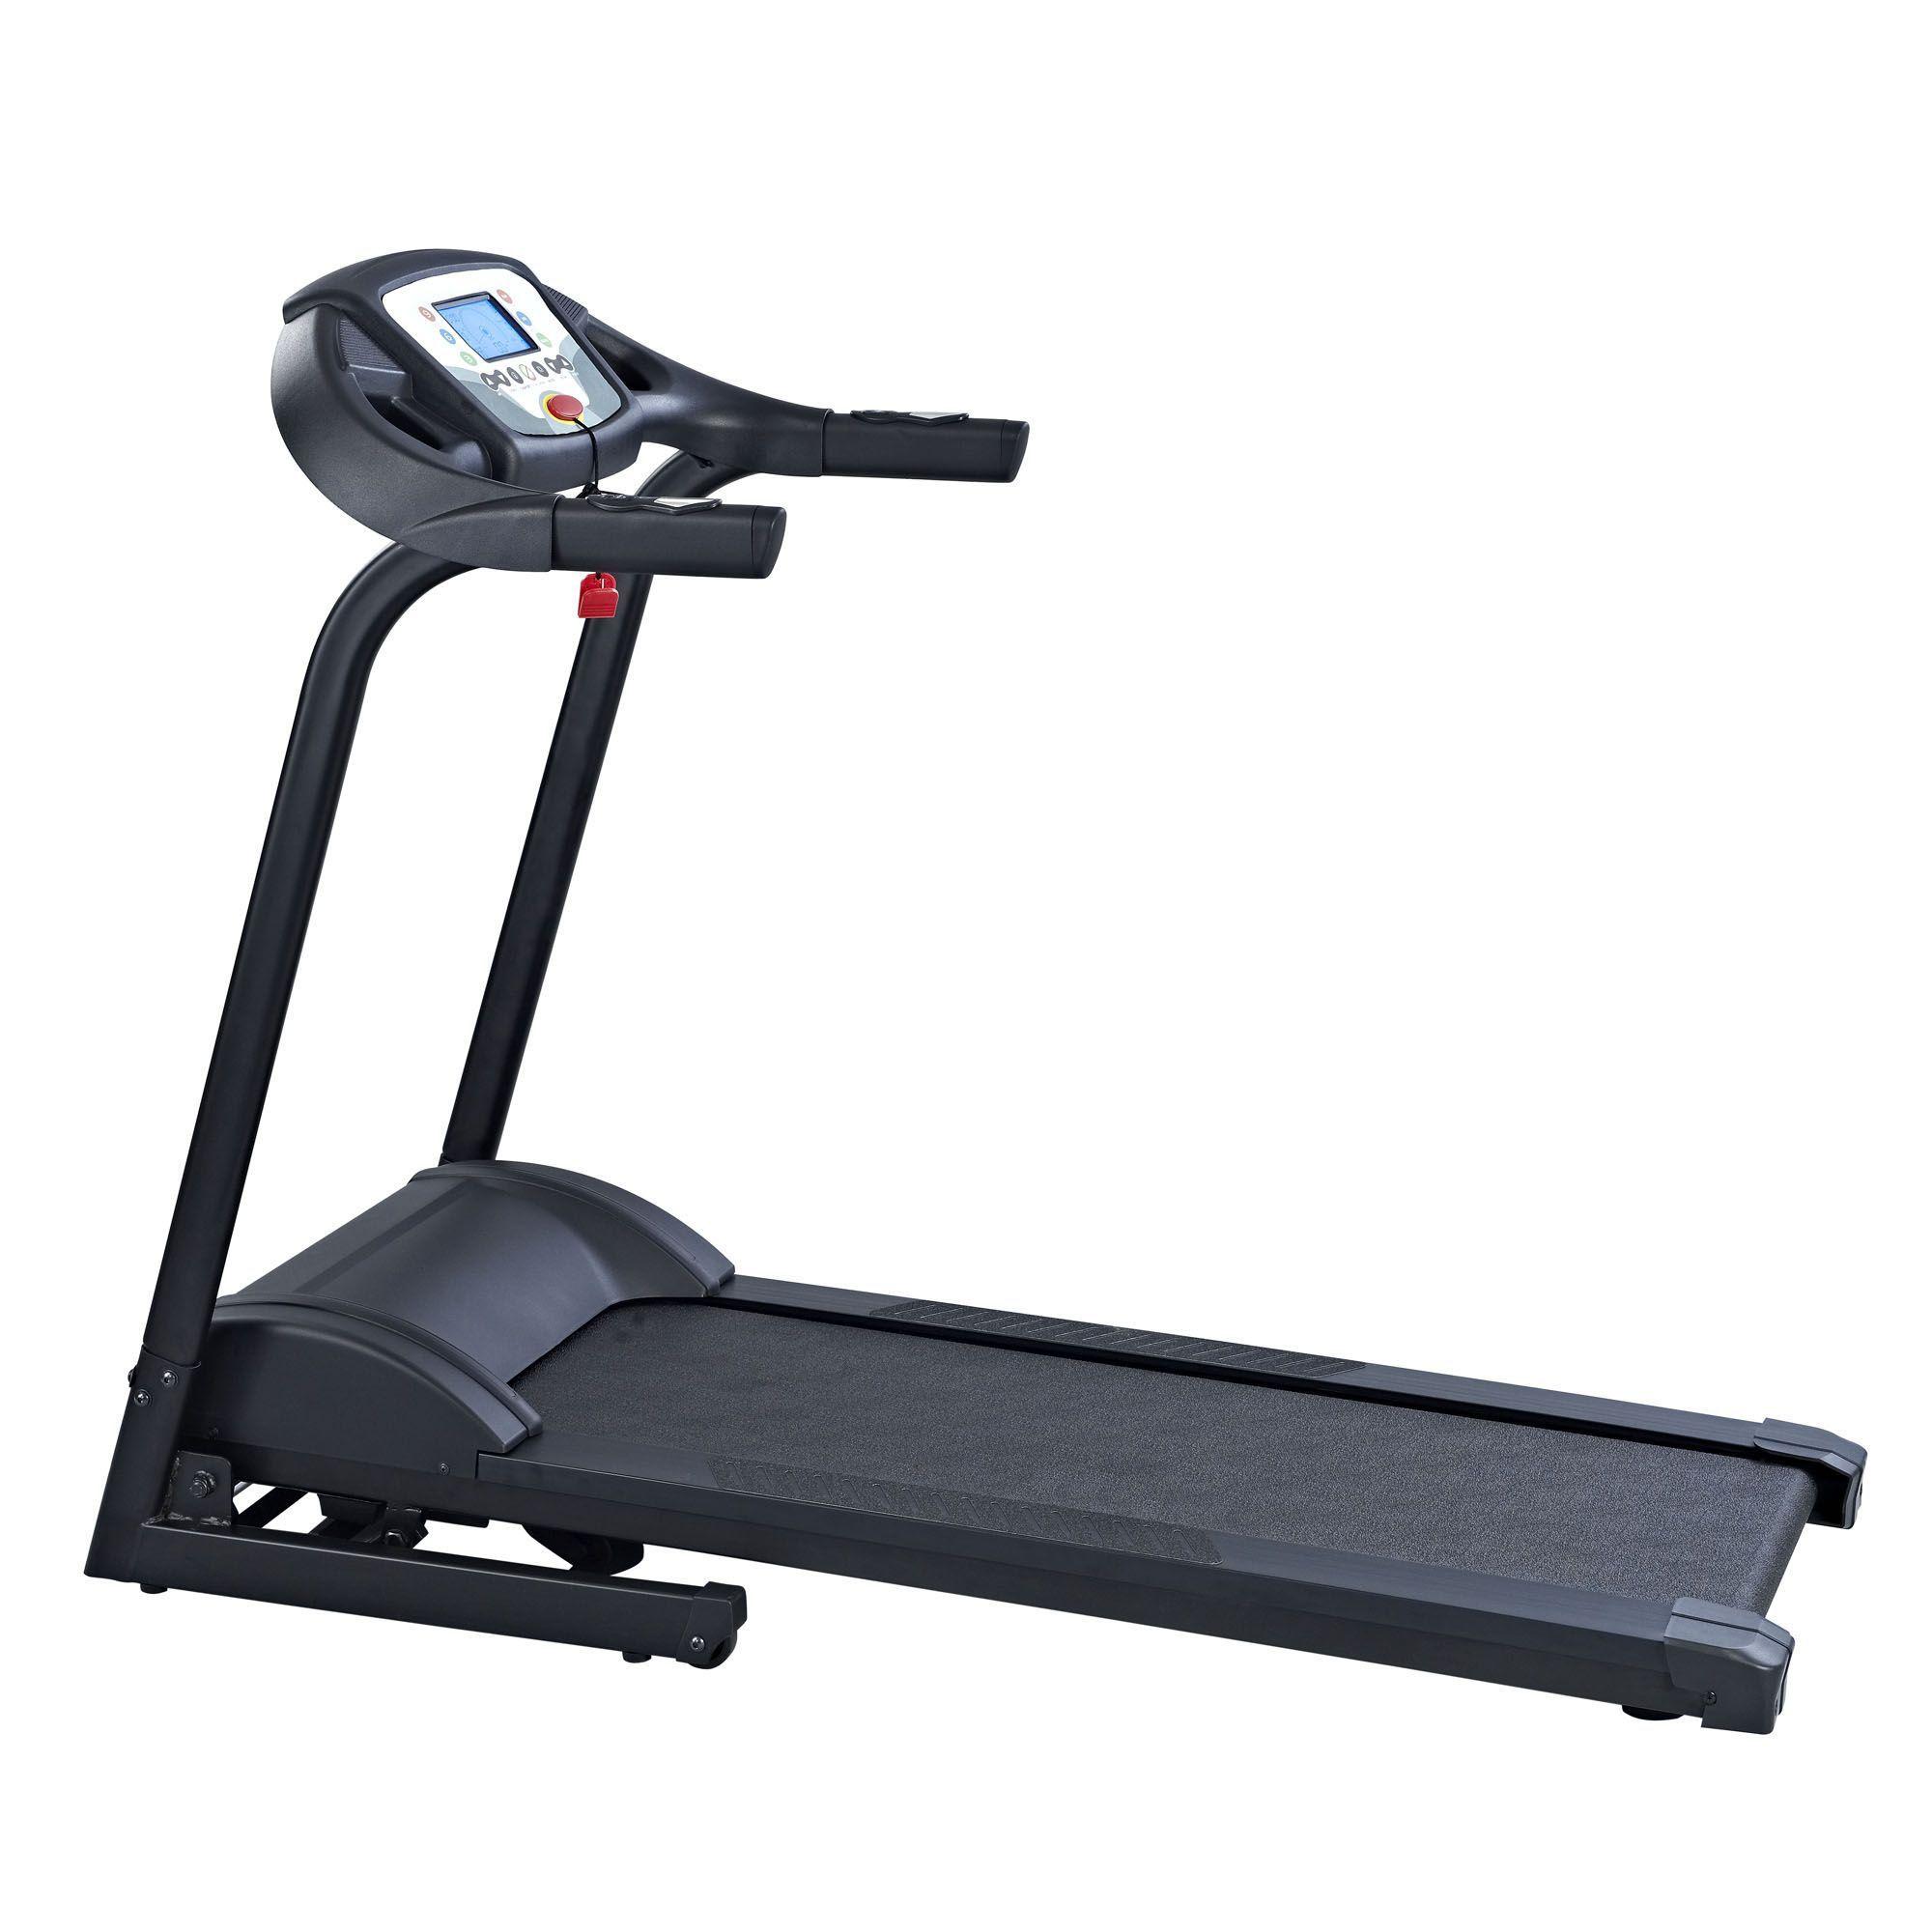 Foldable Water Bottle >> Fuel Fitness 3.0 Treadmill - Sweatband.com